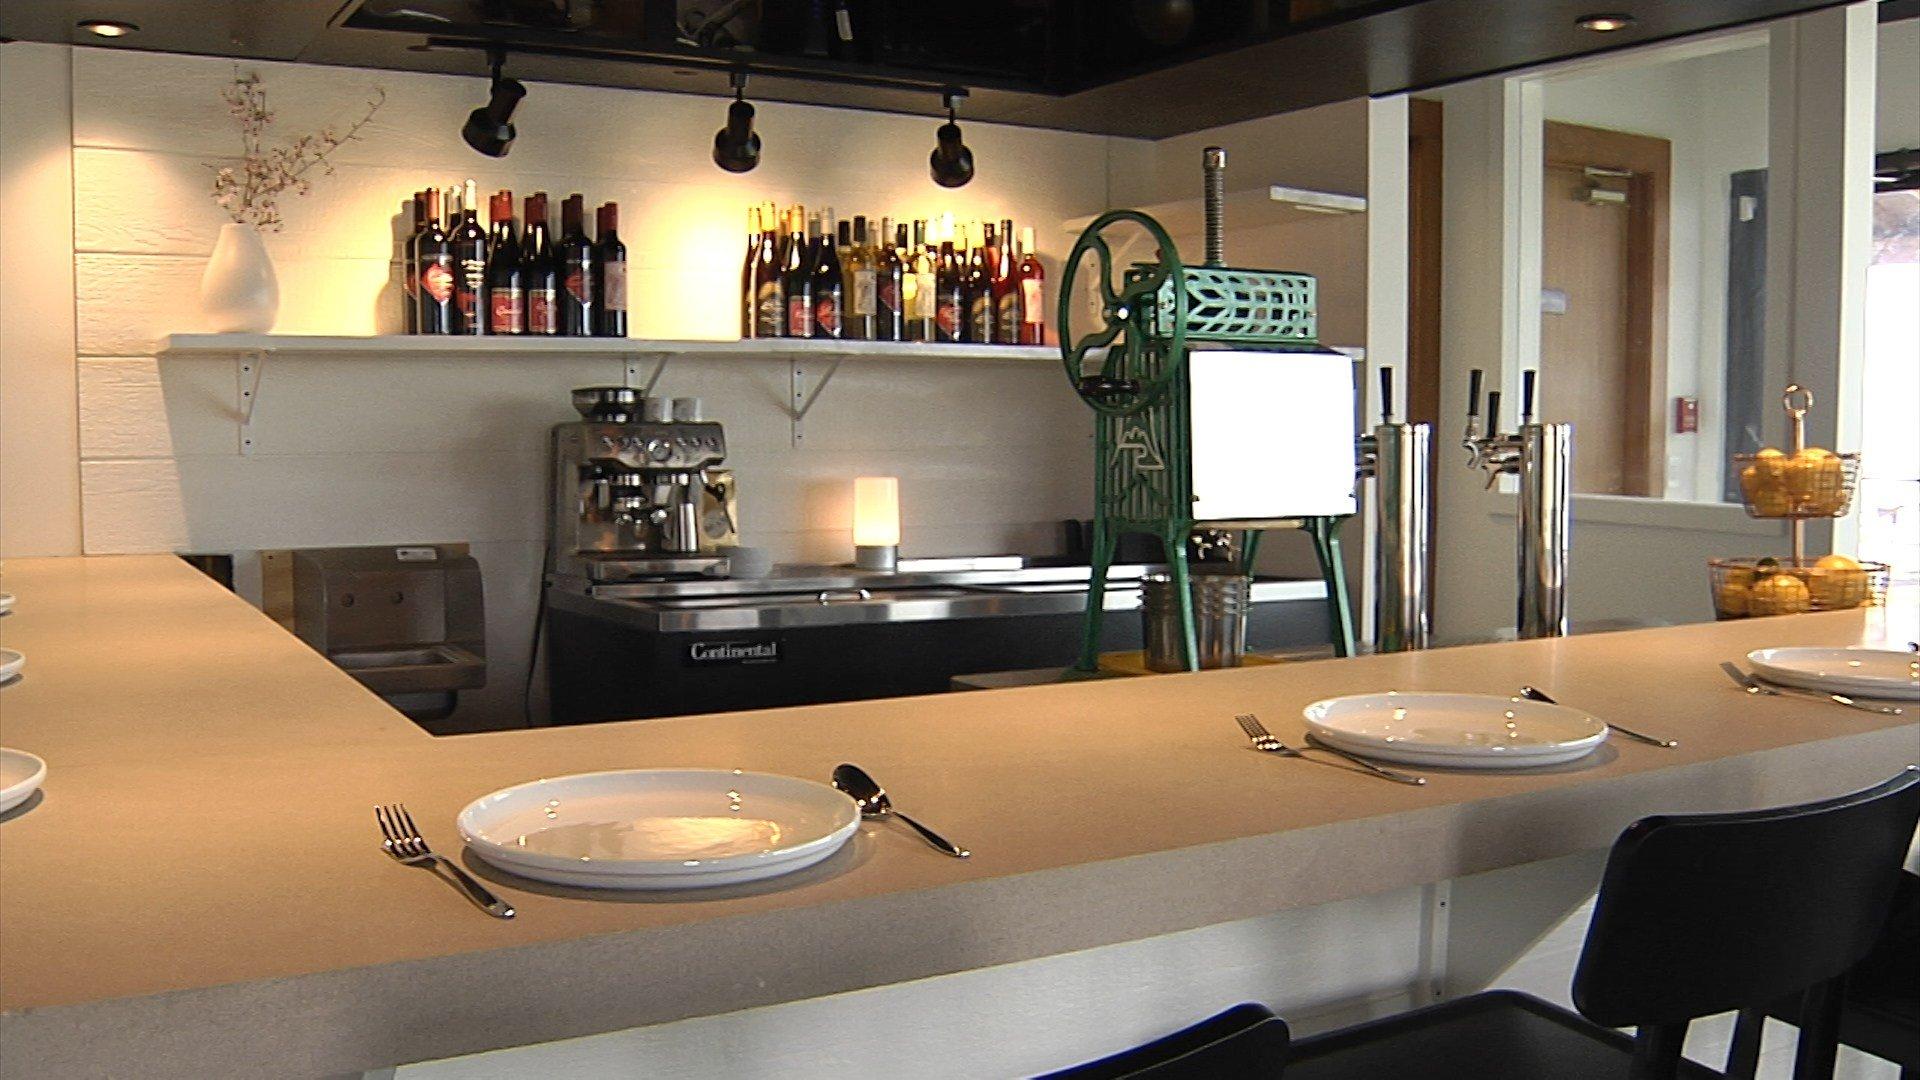 Bathroom Fixtures Erie Pa new restaurant noosa opens soon at north east marina - erie news